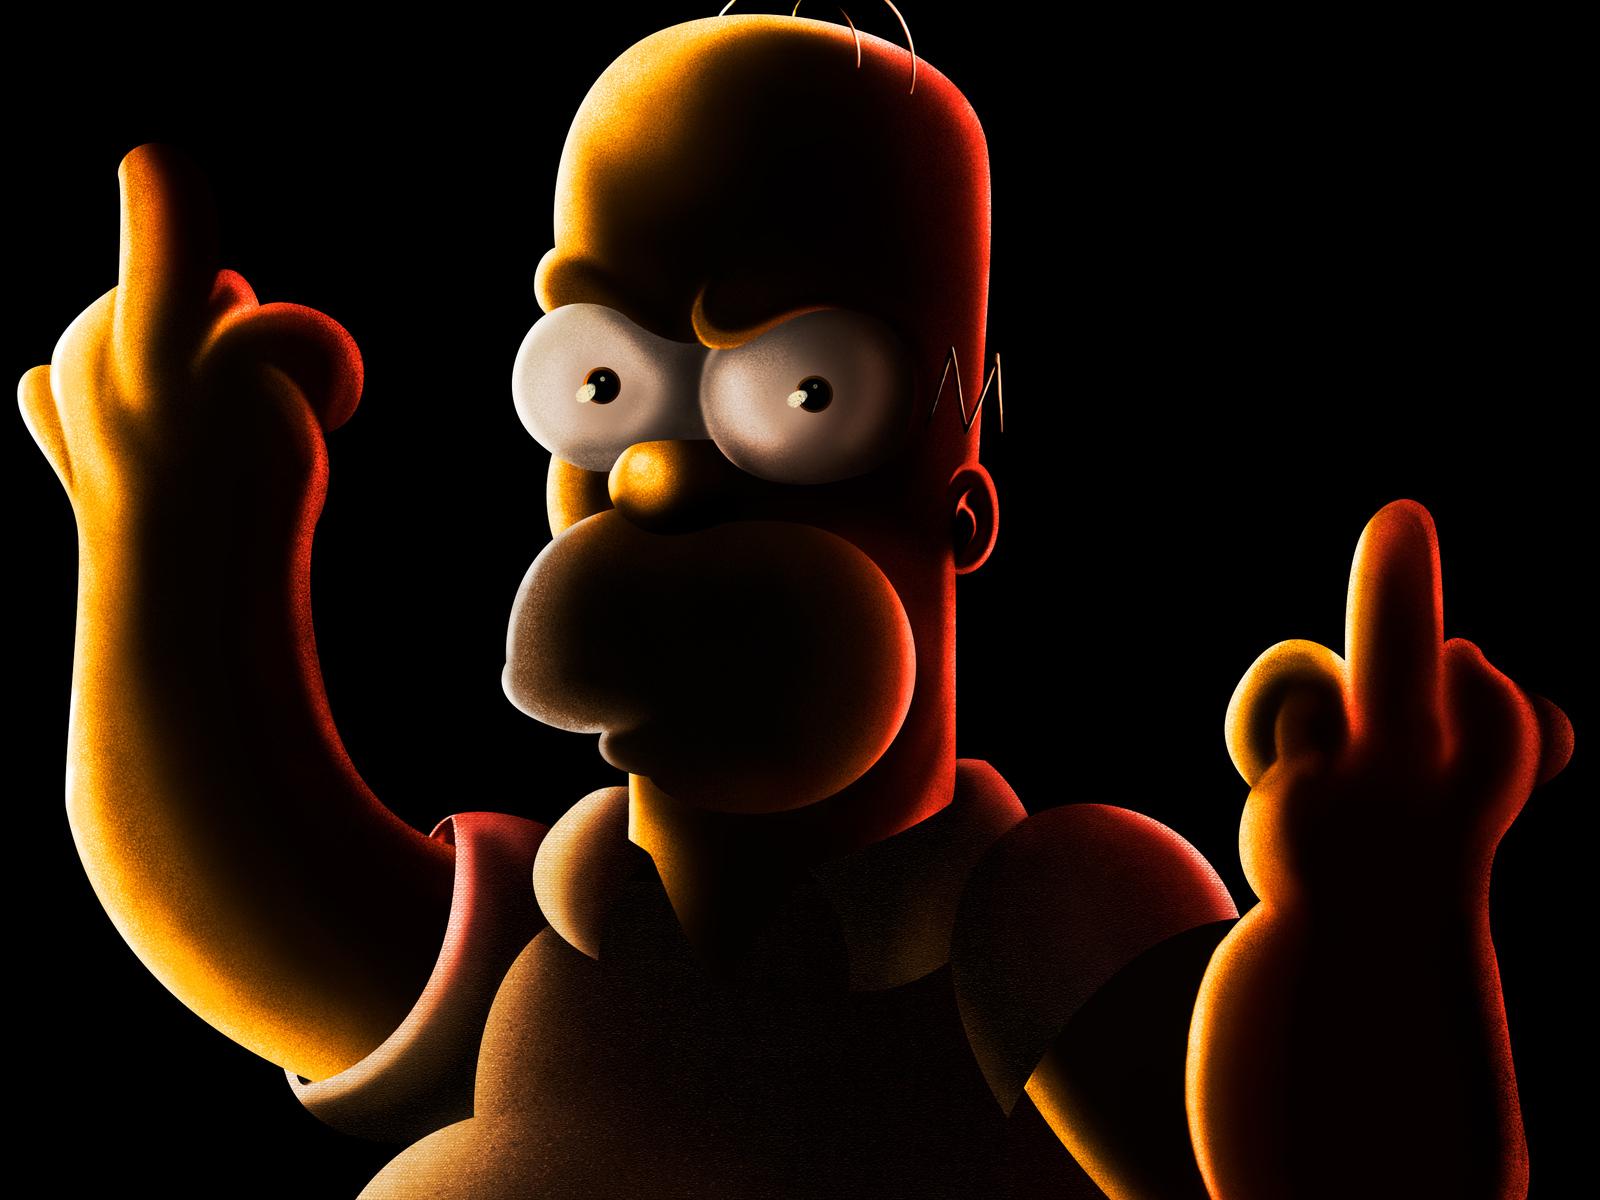 1600x1200 Bart Simpson 1600x1200 Resolution HD 4k ...